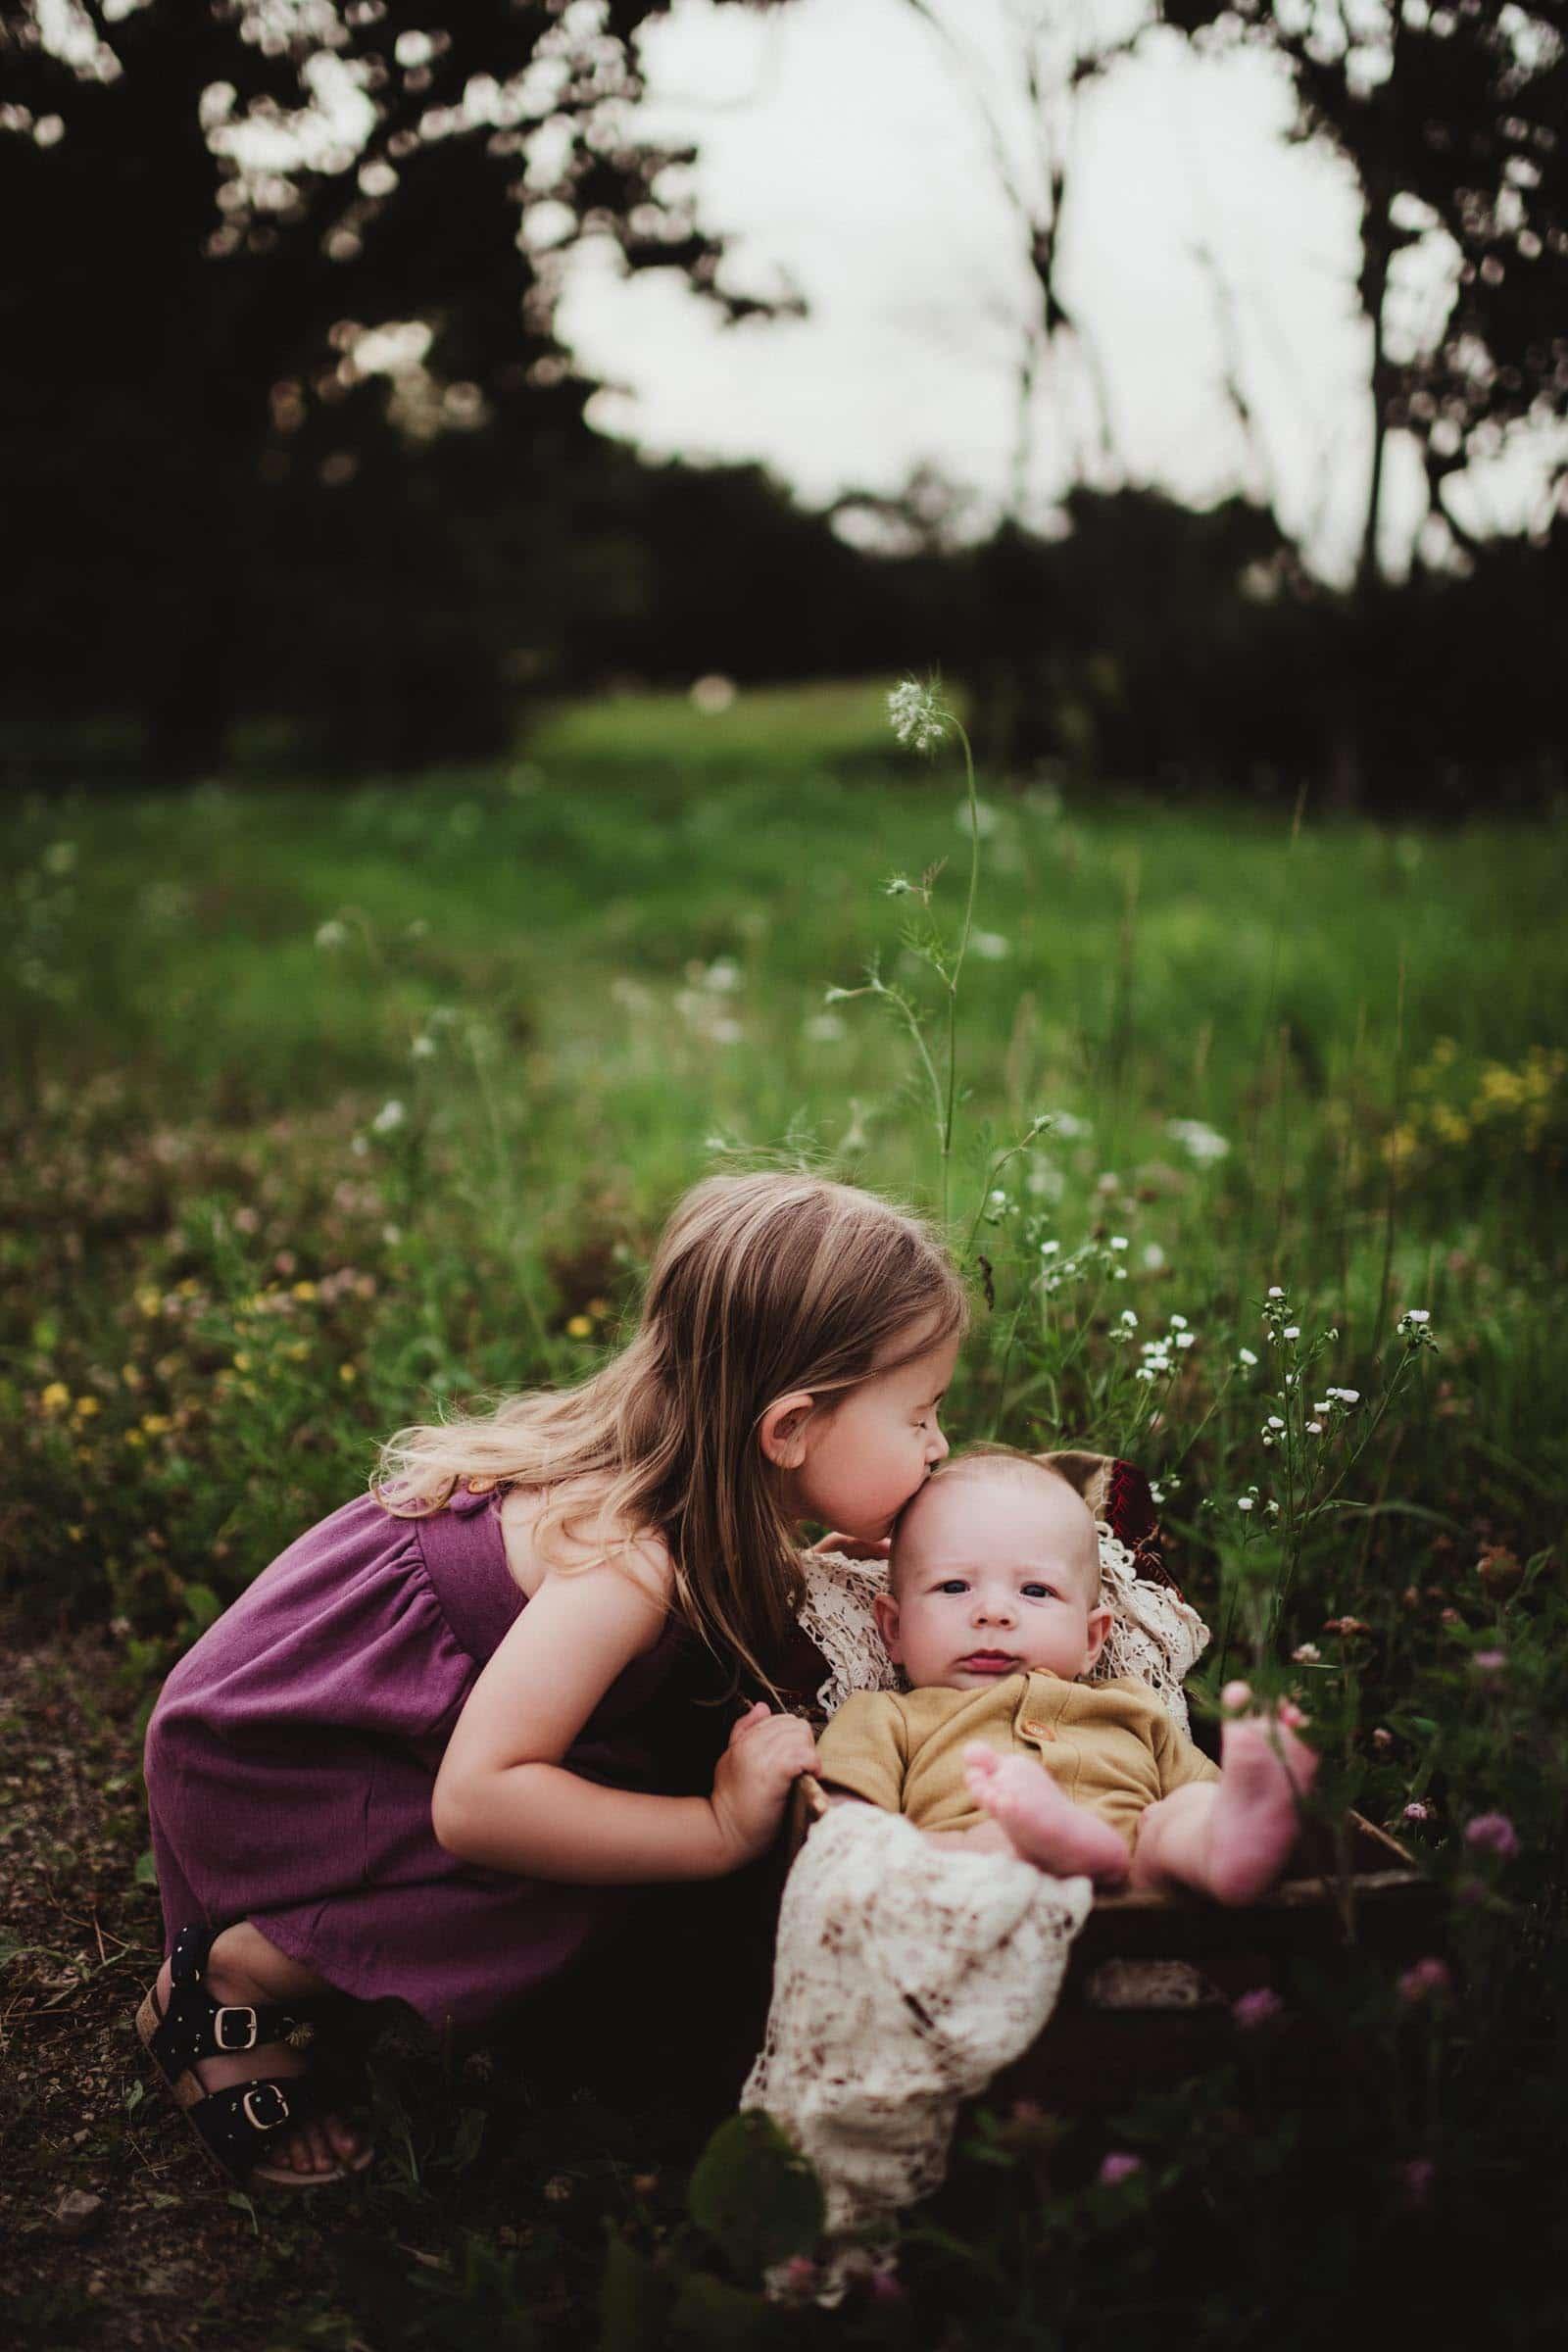 Little Girl Kissing Baby Sibling in Field